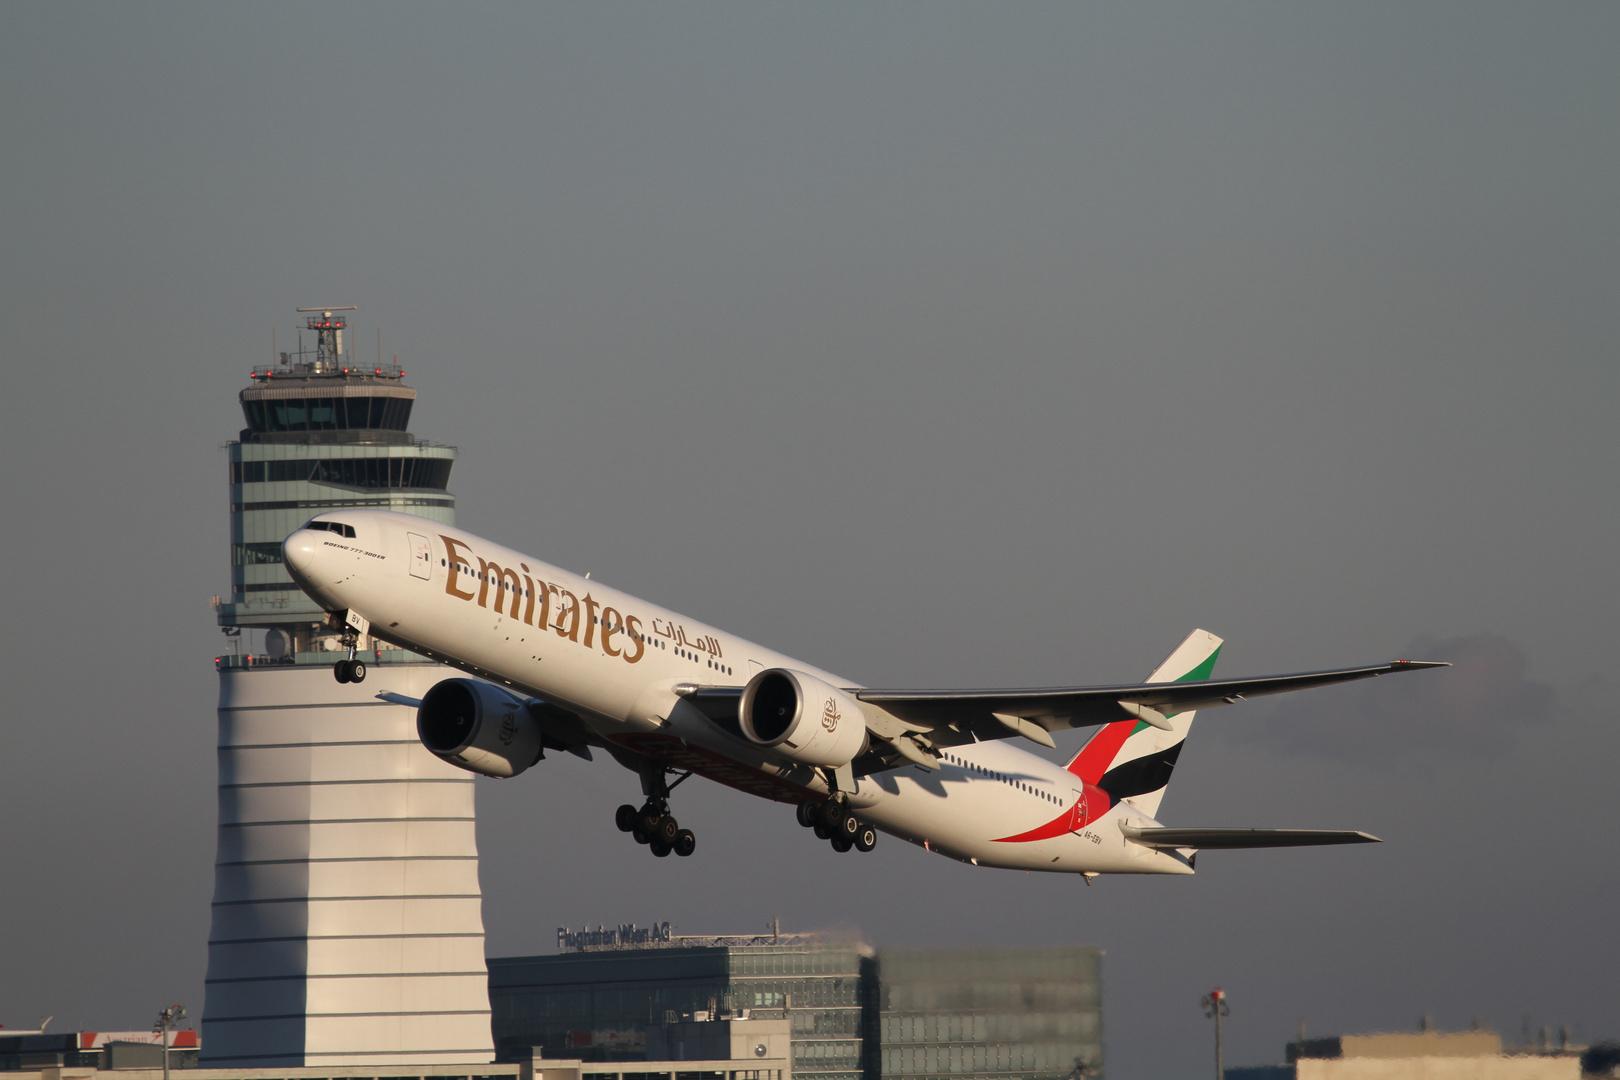 'Emirates' A6-EBV